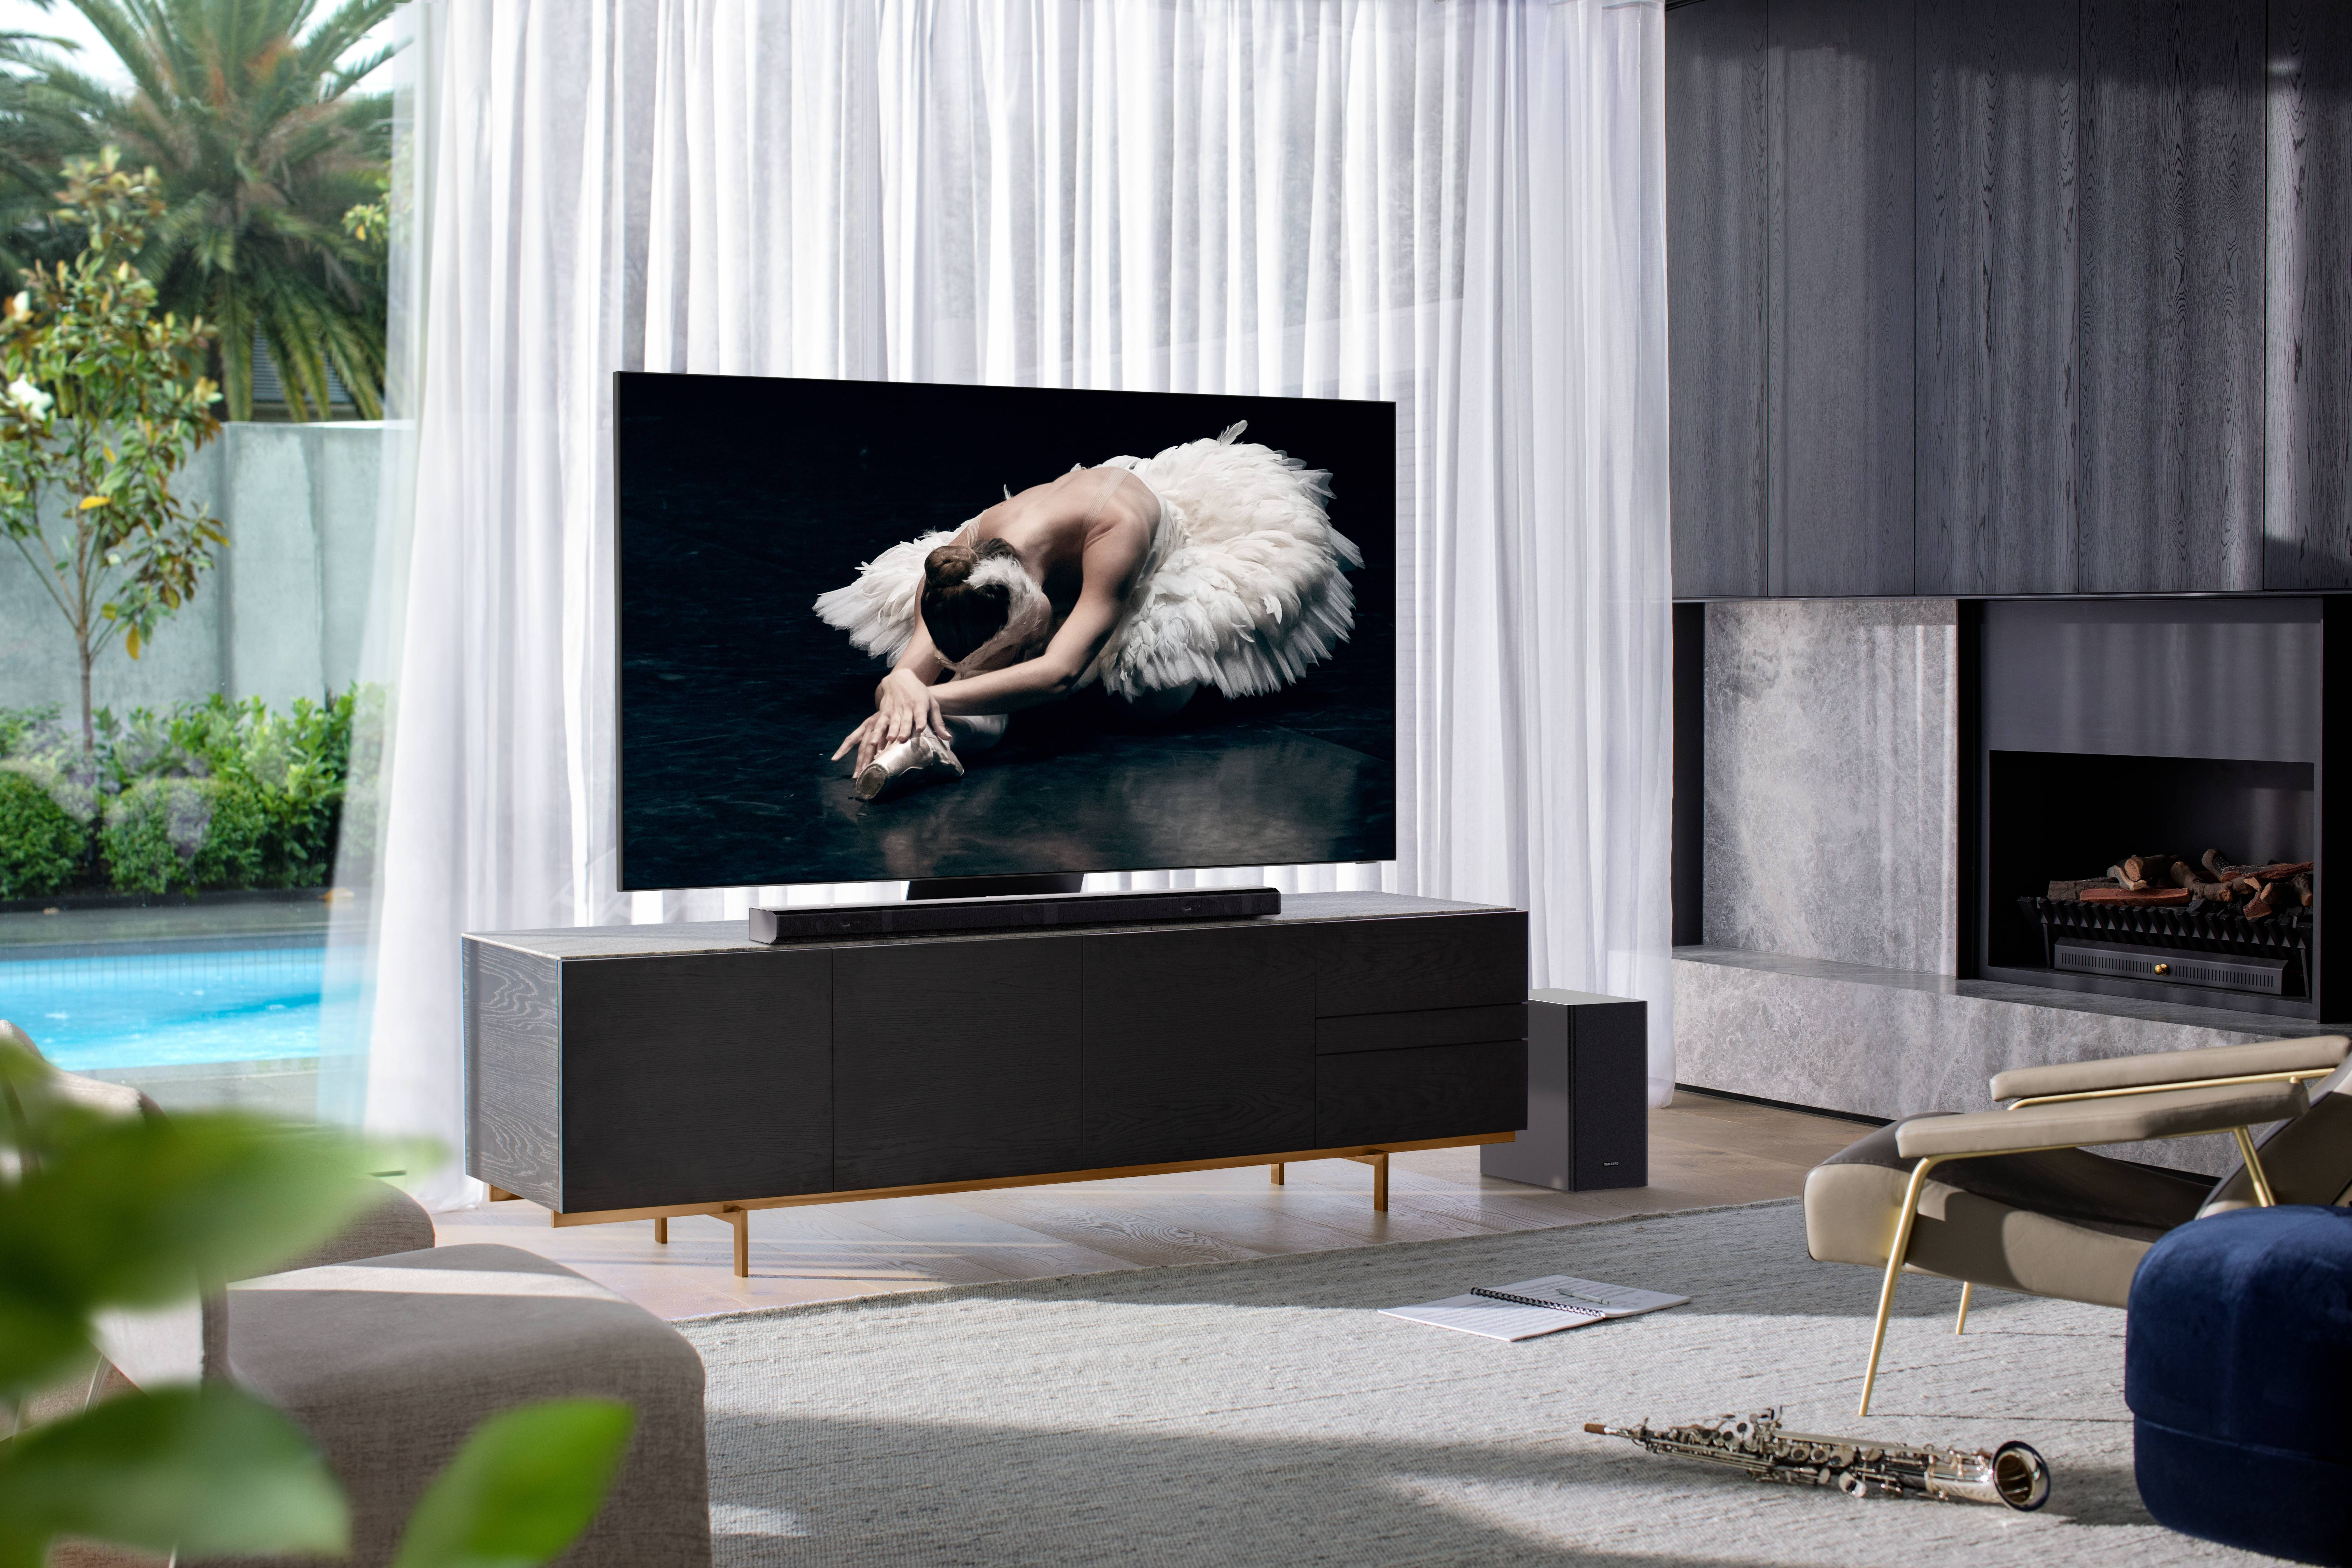 Samsung cho the gioi thay am thanh tren TV nen 'thong minh' the nao? hinh anh 3 anh_3_1.jpg